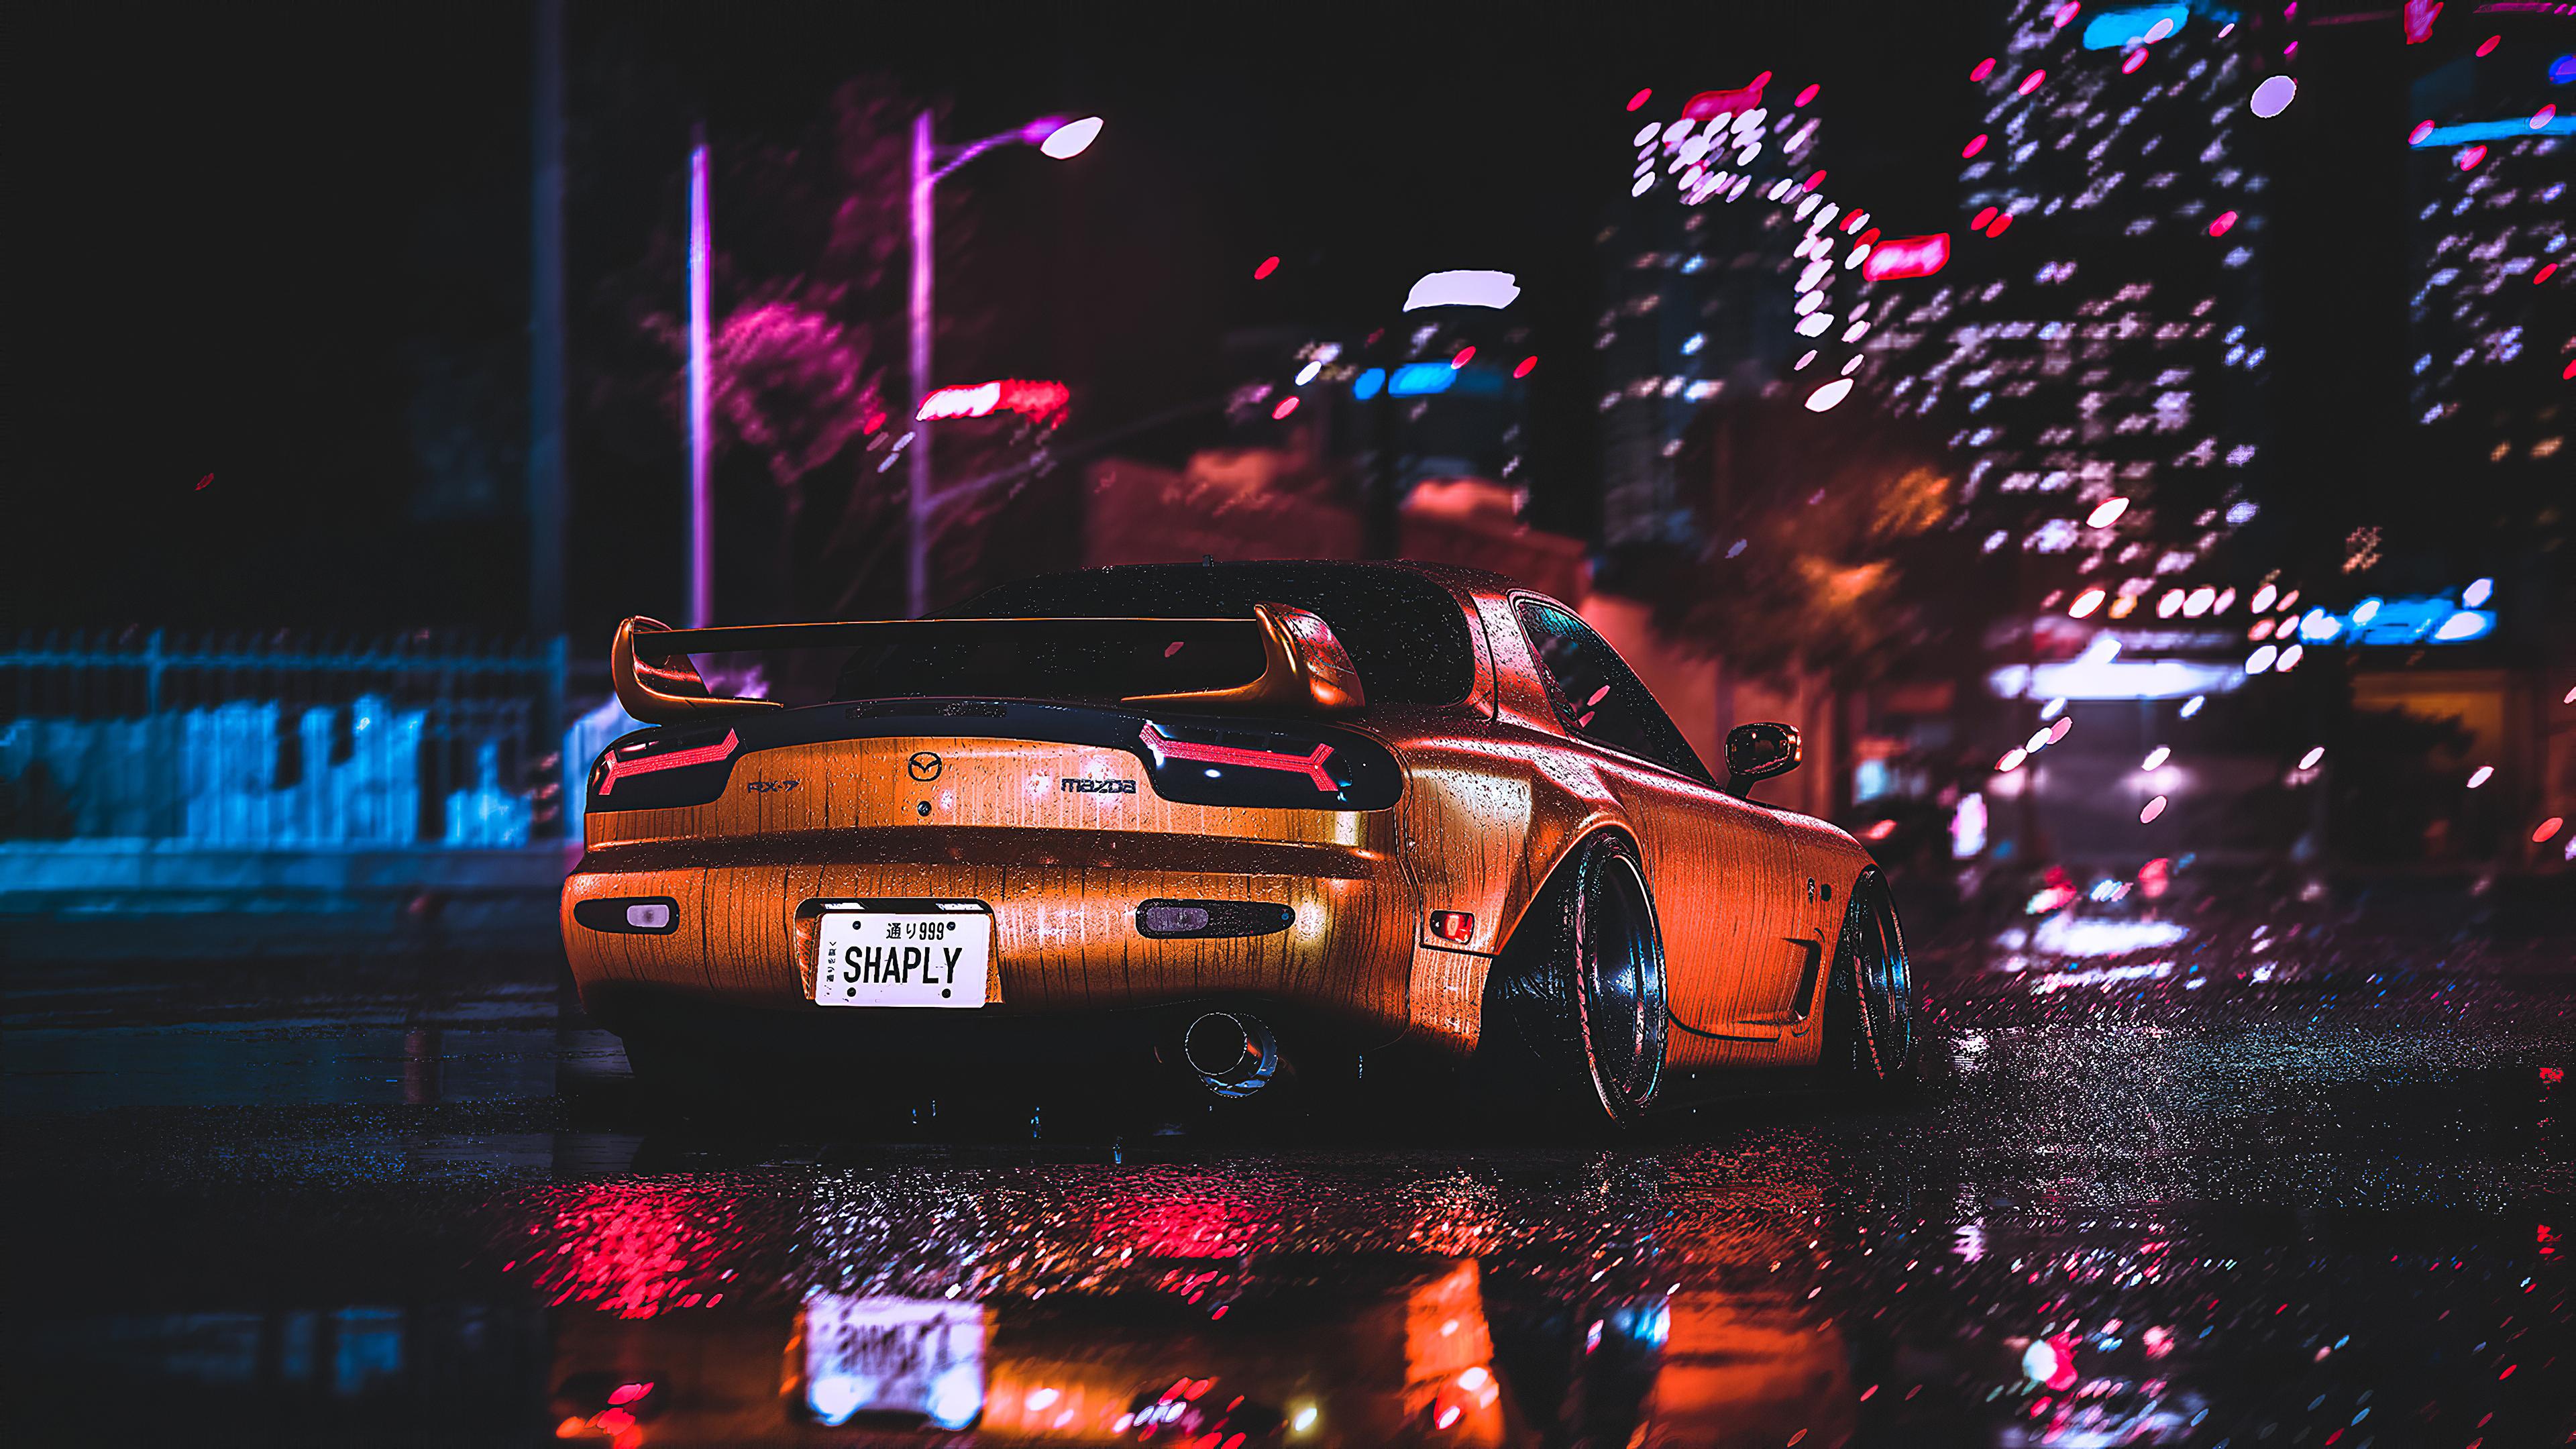 Mazda Rx7 City Night Lights 4k, HD Cars, 4k Wallpapers ...